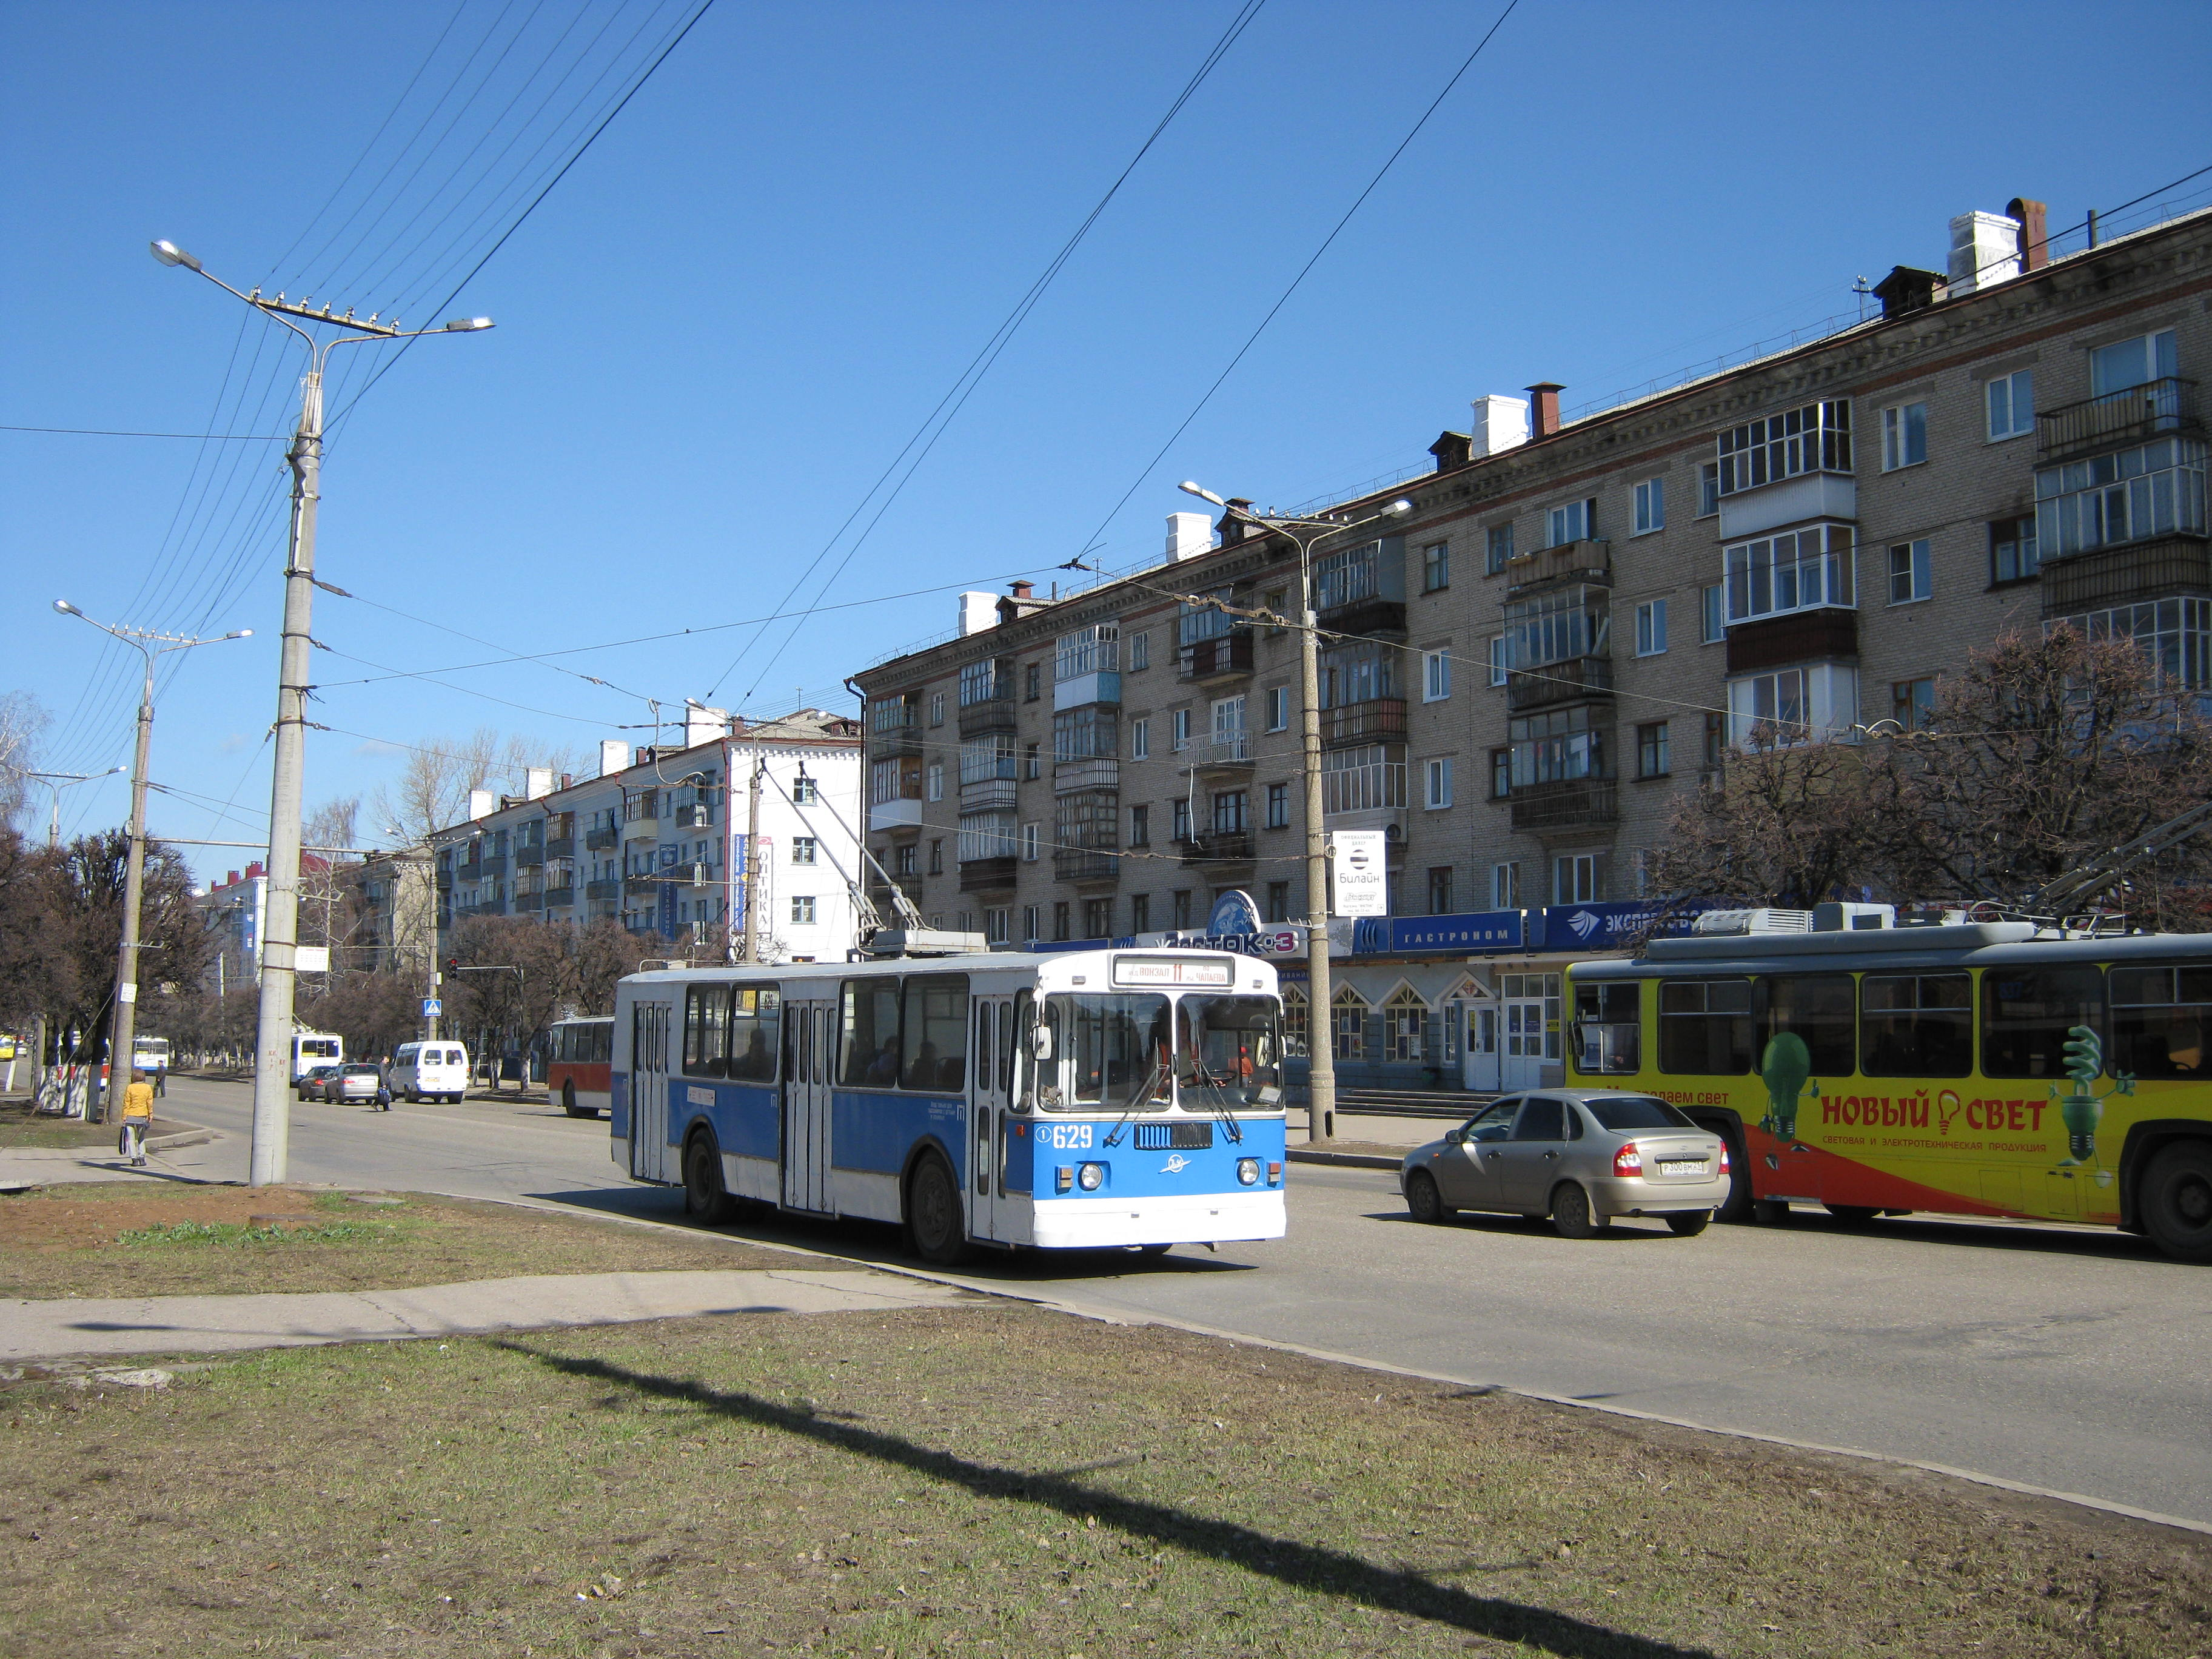 HPP Cheboksary: description, history and interesting facts 25